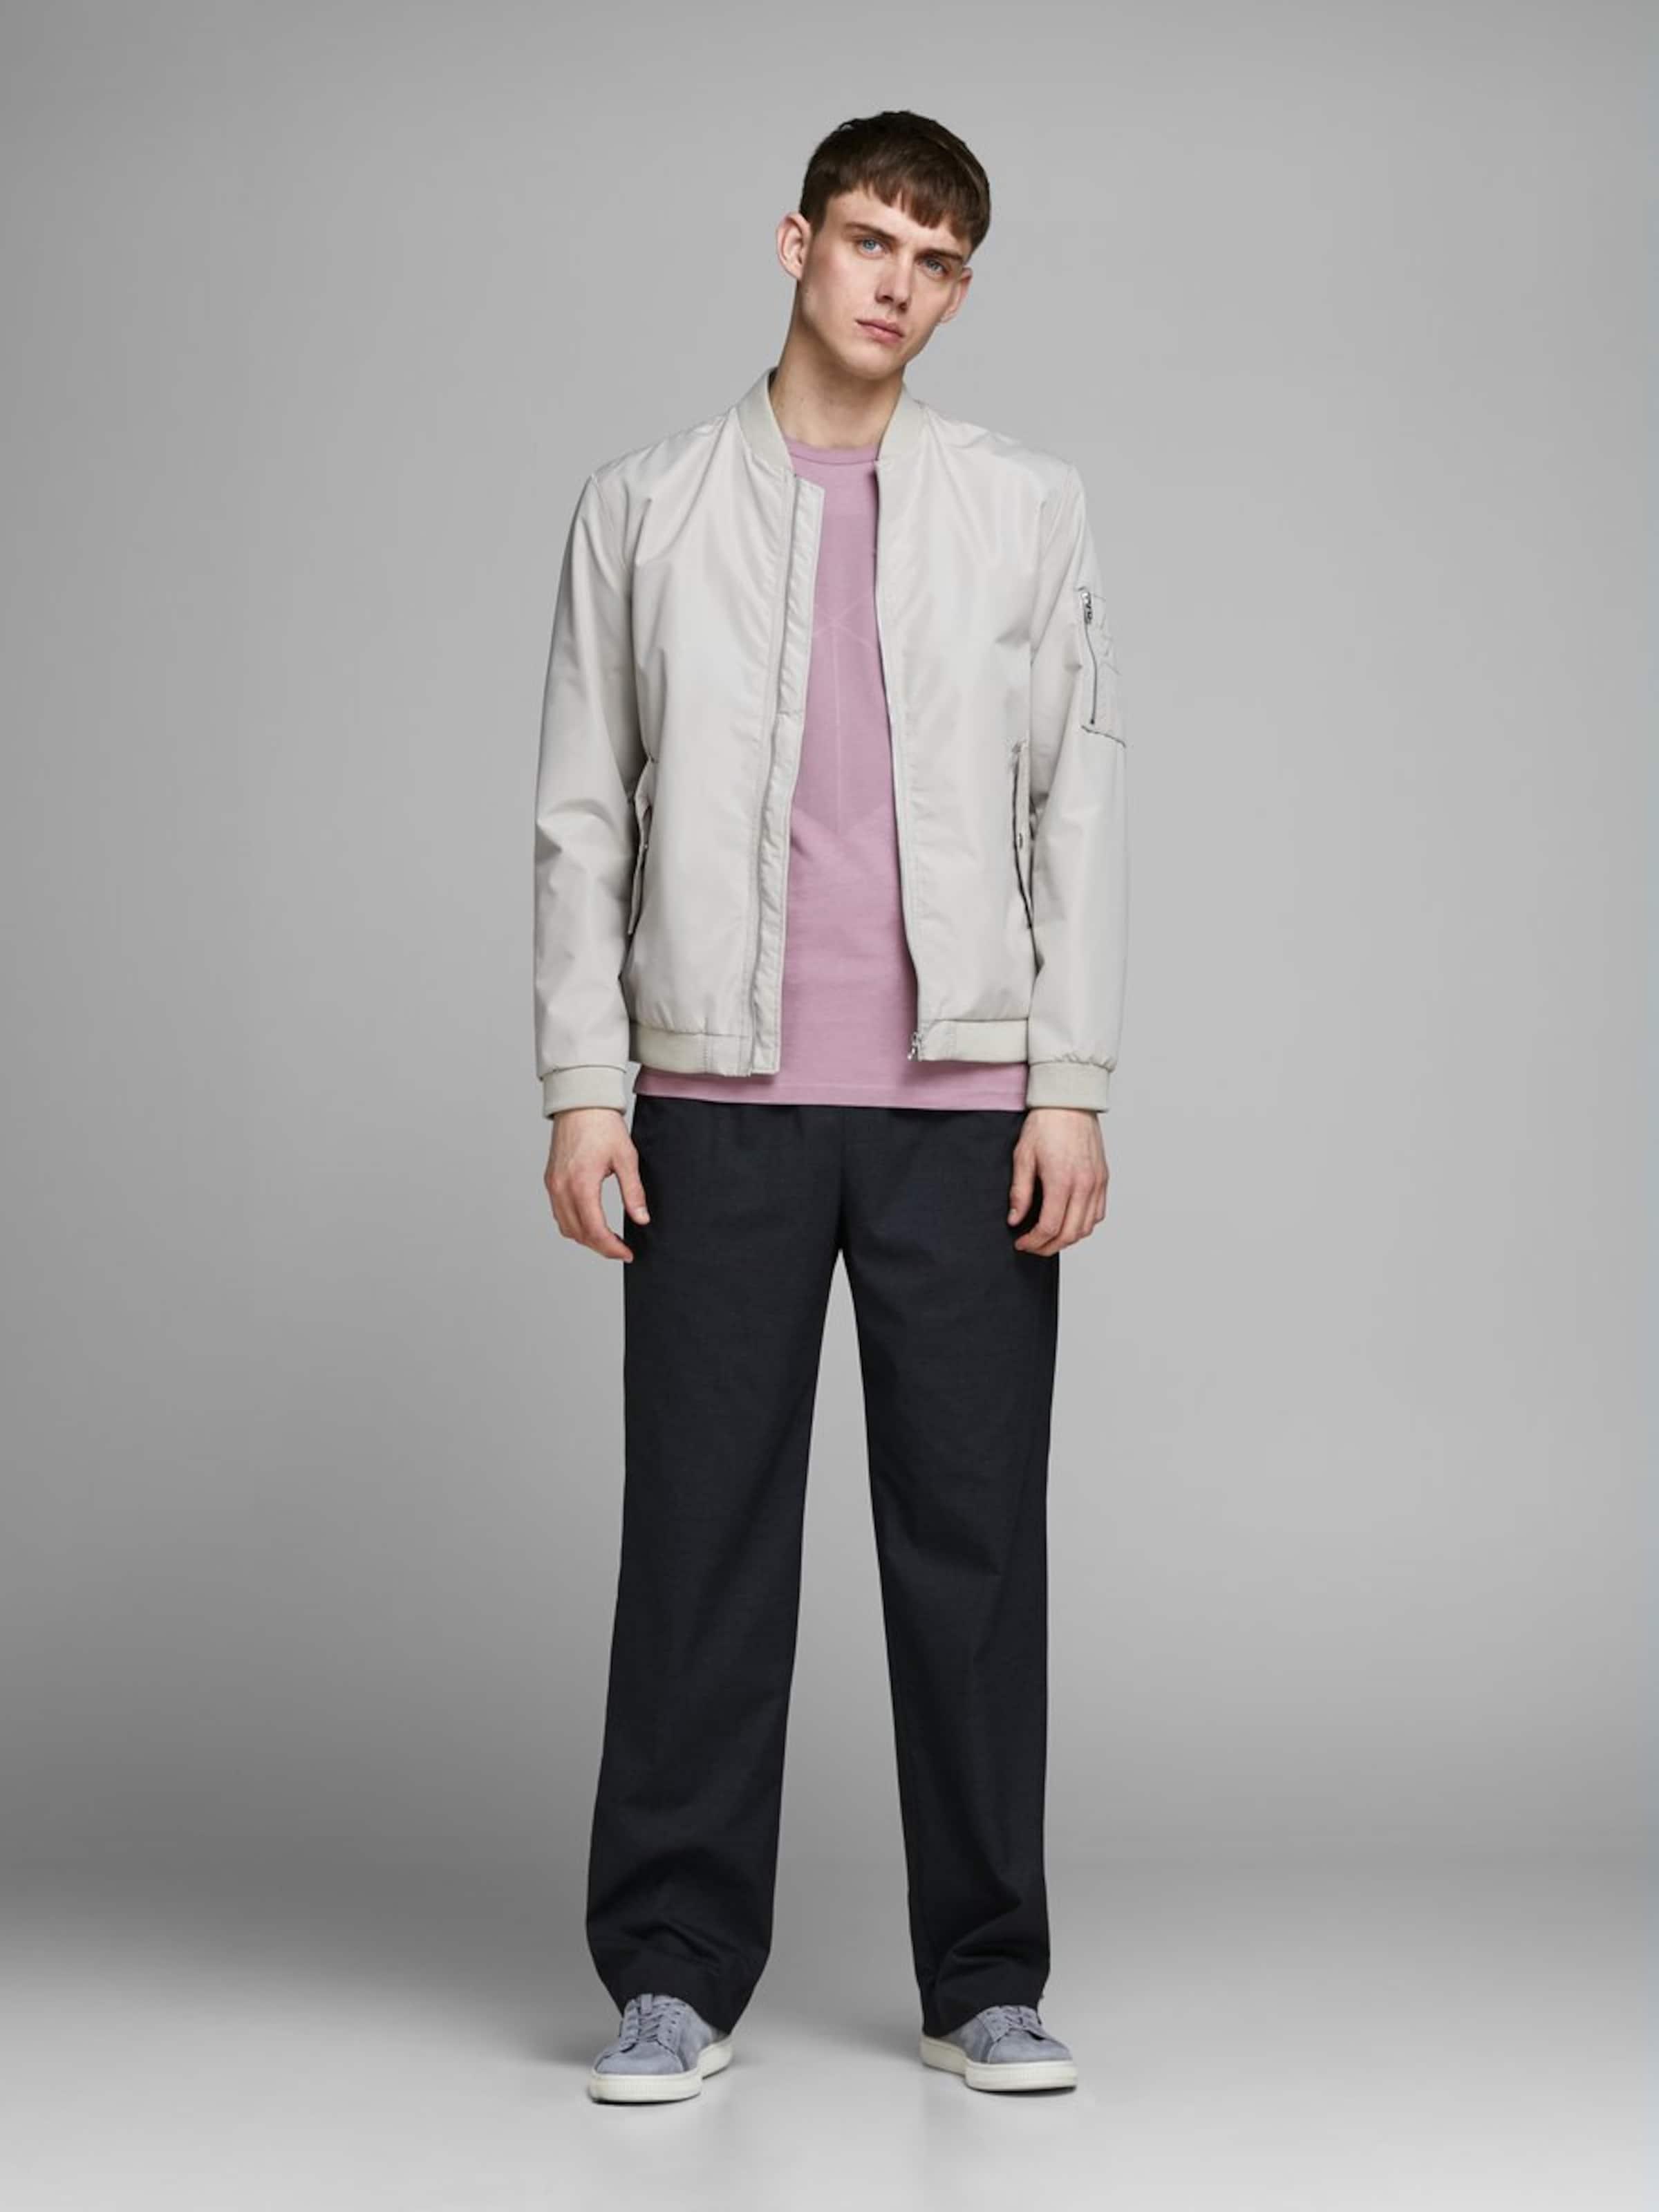 Jones Jackamp; Mauve shirt T In ZPwkXTOiu